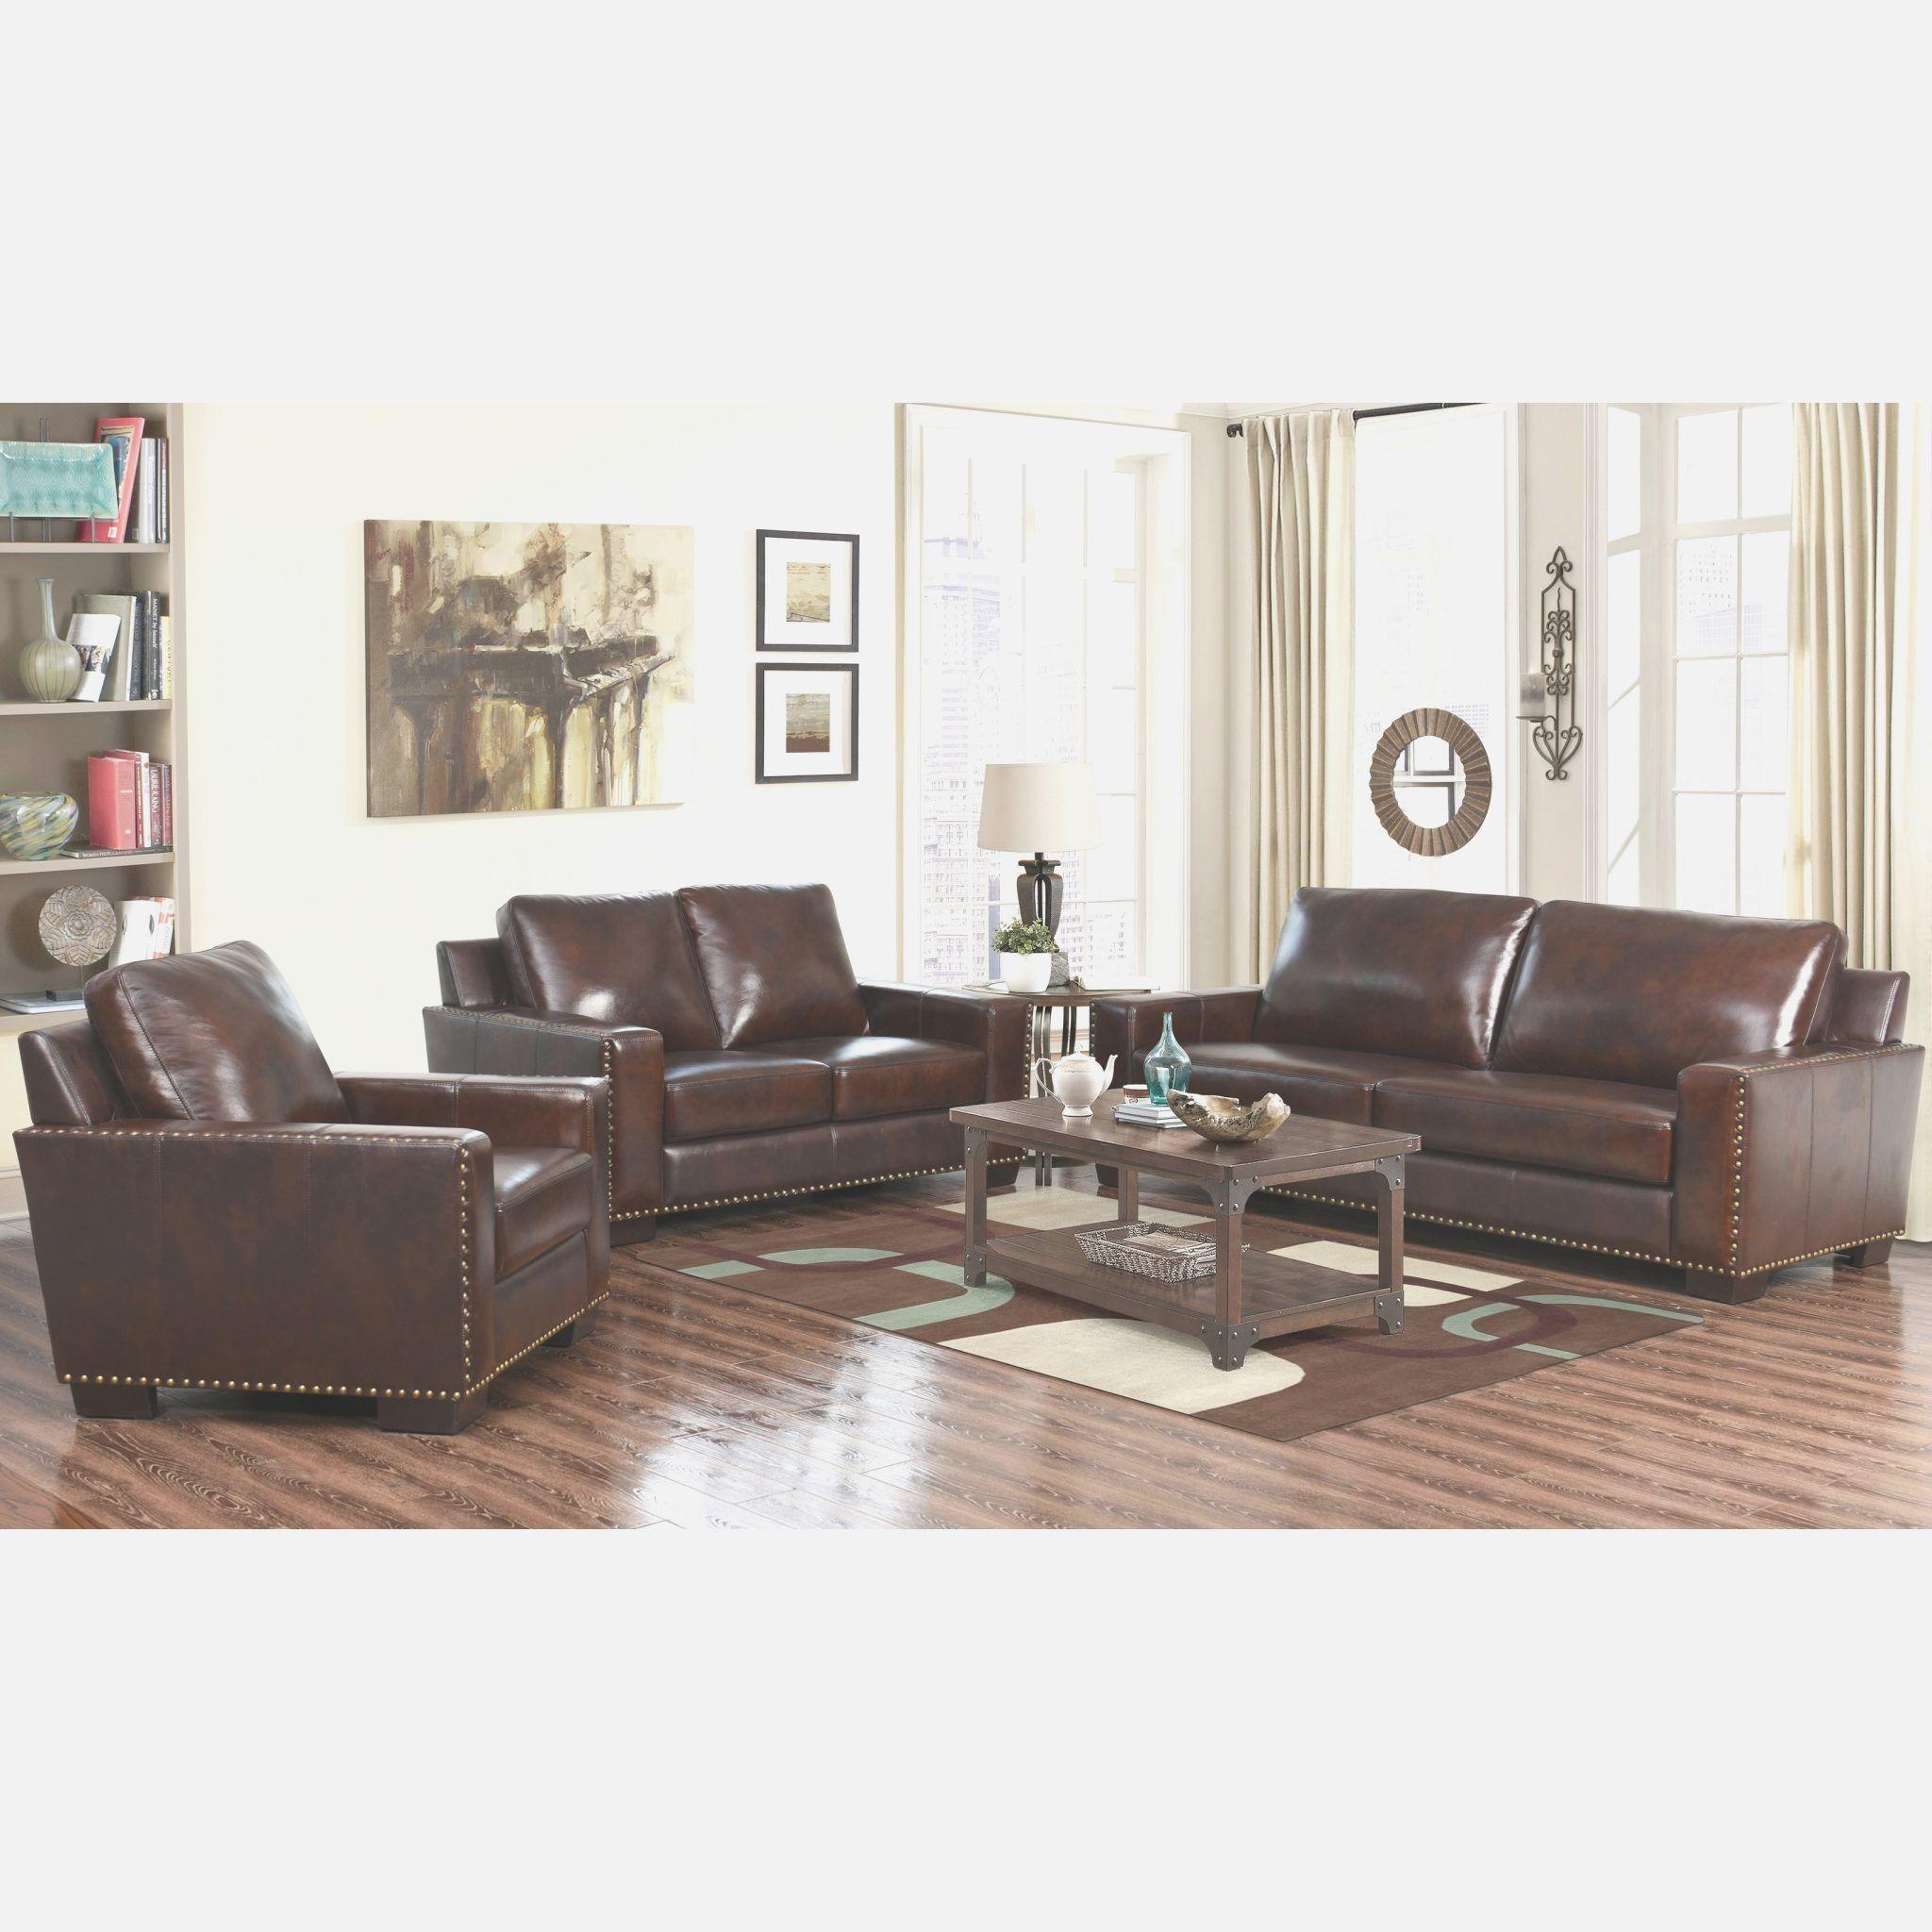 Abbyson Living Bradford Faux Leather Reclining Sofa Dark Brown Big Cream Cushions Monaco And Loveseat